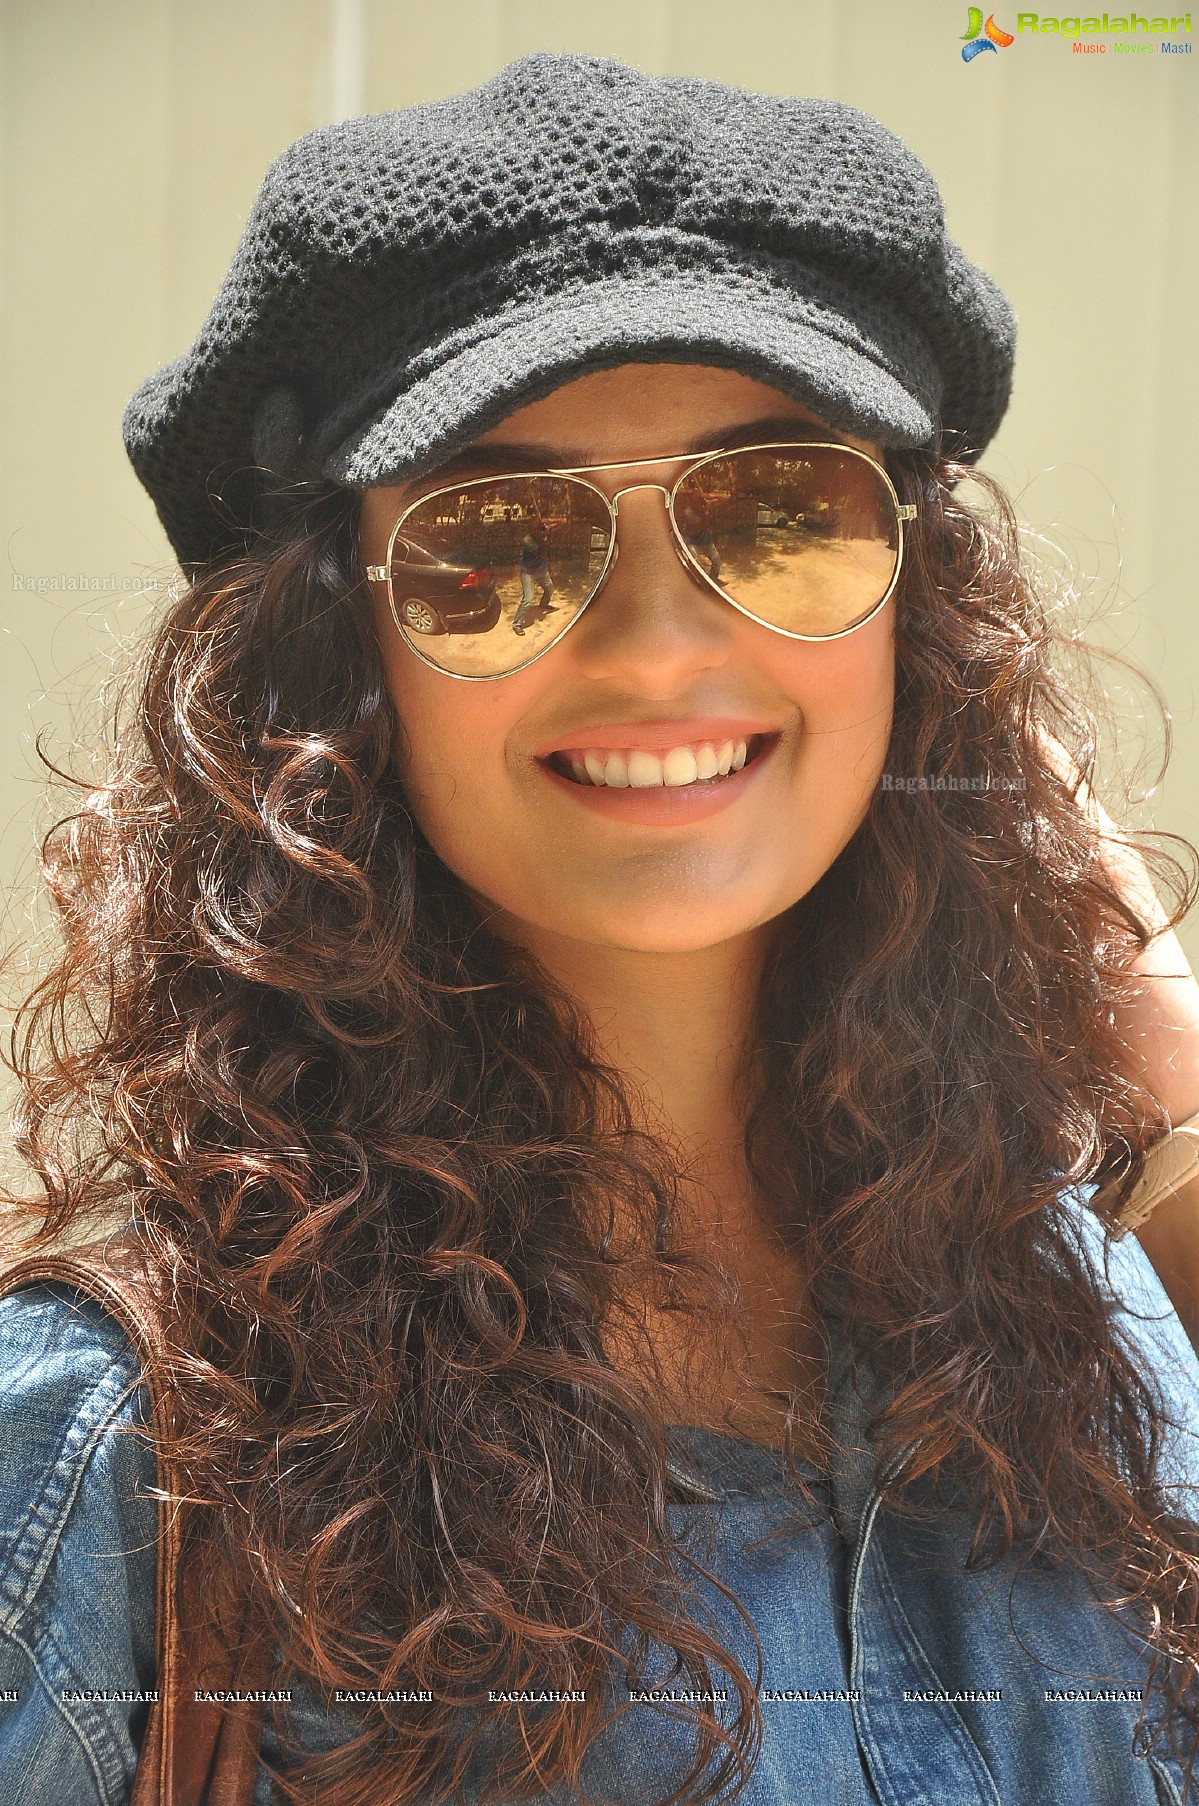 Seerat Kapoor Image 181 Telugu Movie Actress Photos Telugu